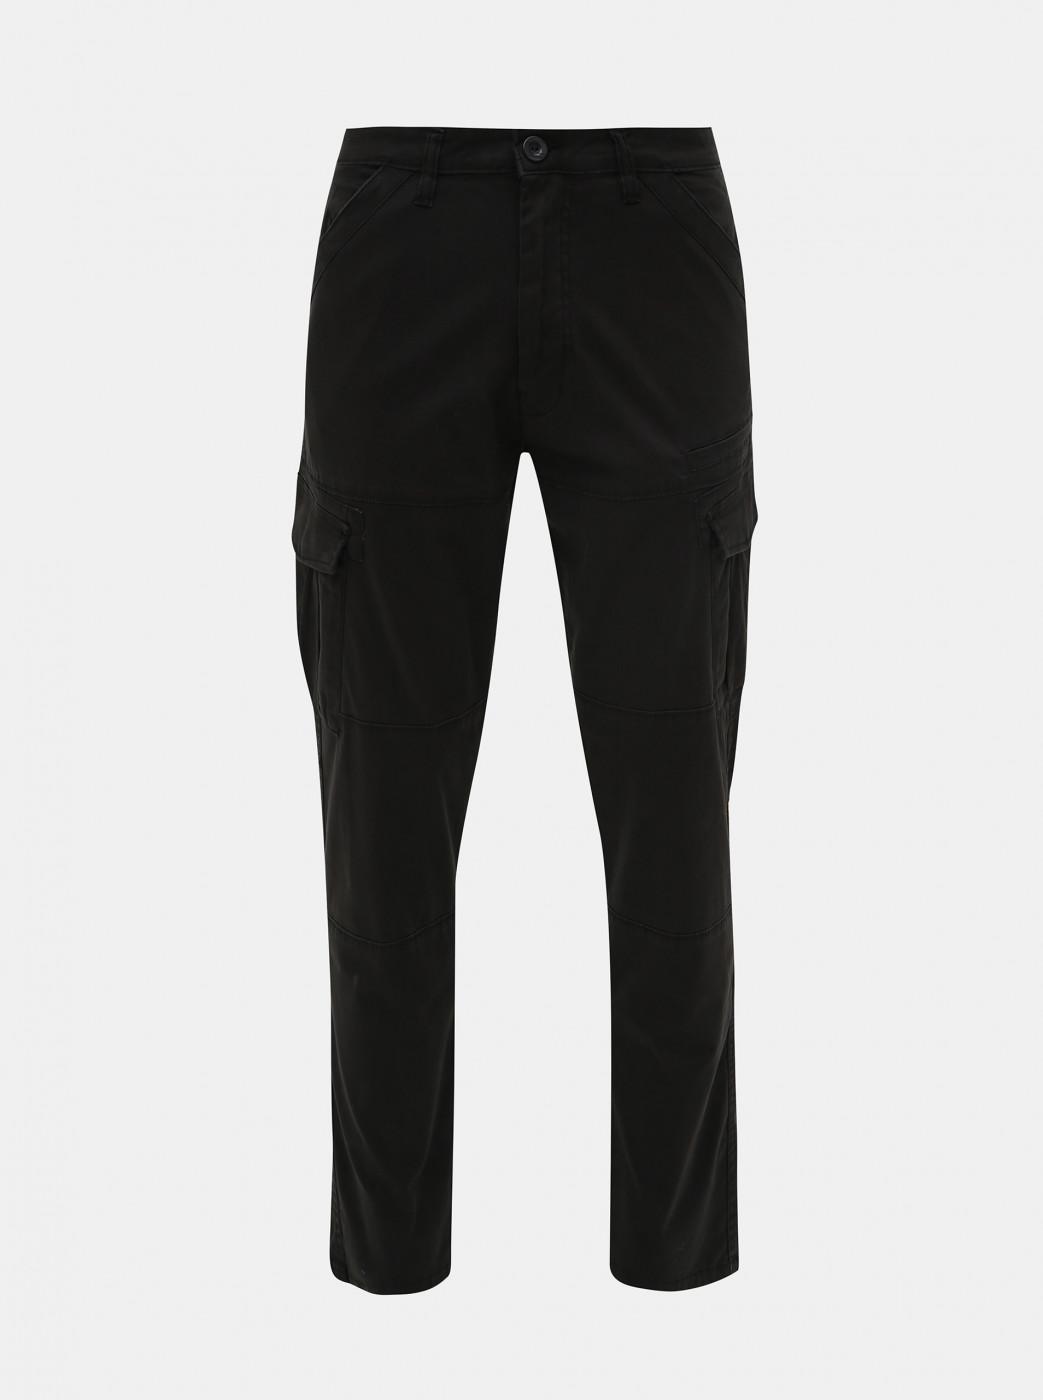 Loap Vivid Men's Black Pants